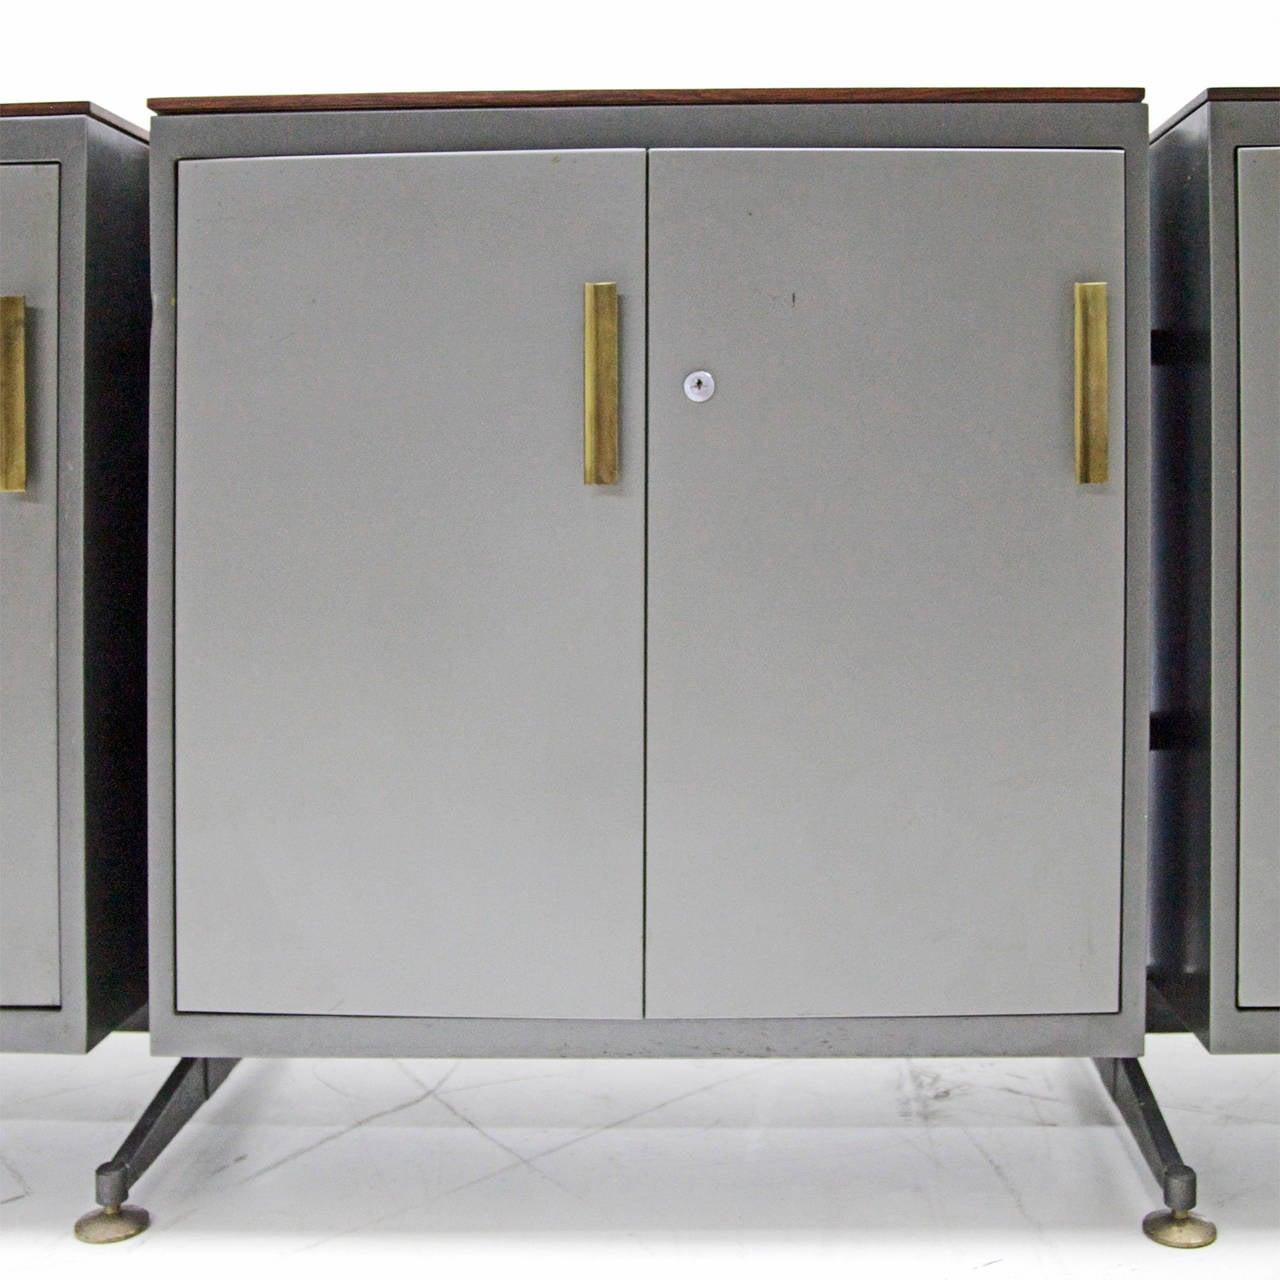 Sideboard Industrial Look ~ Industrial sideboard in the style of osvaldo borsani from